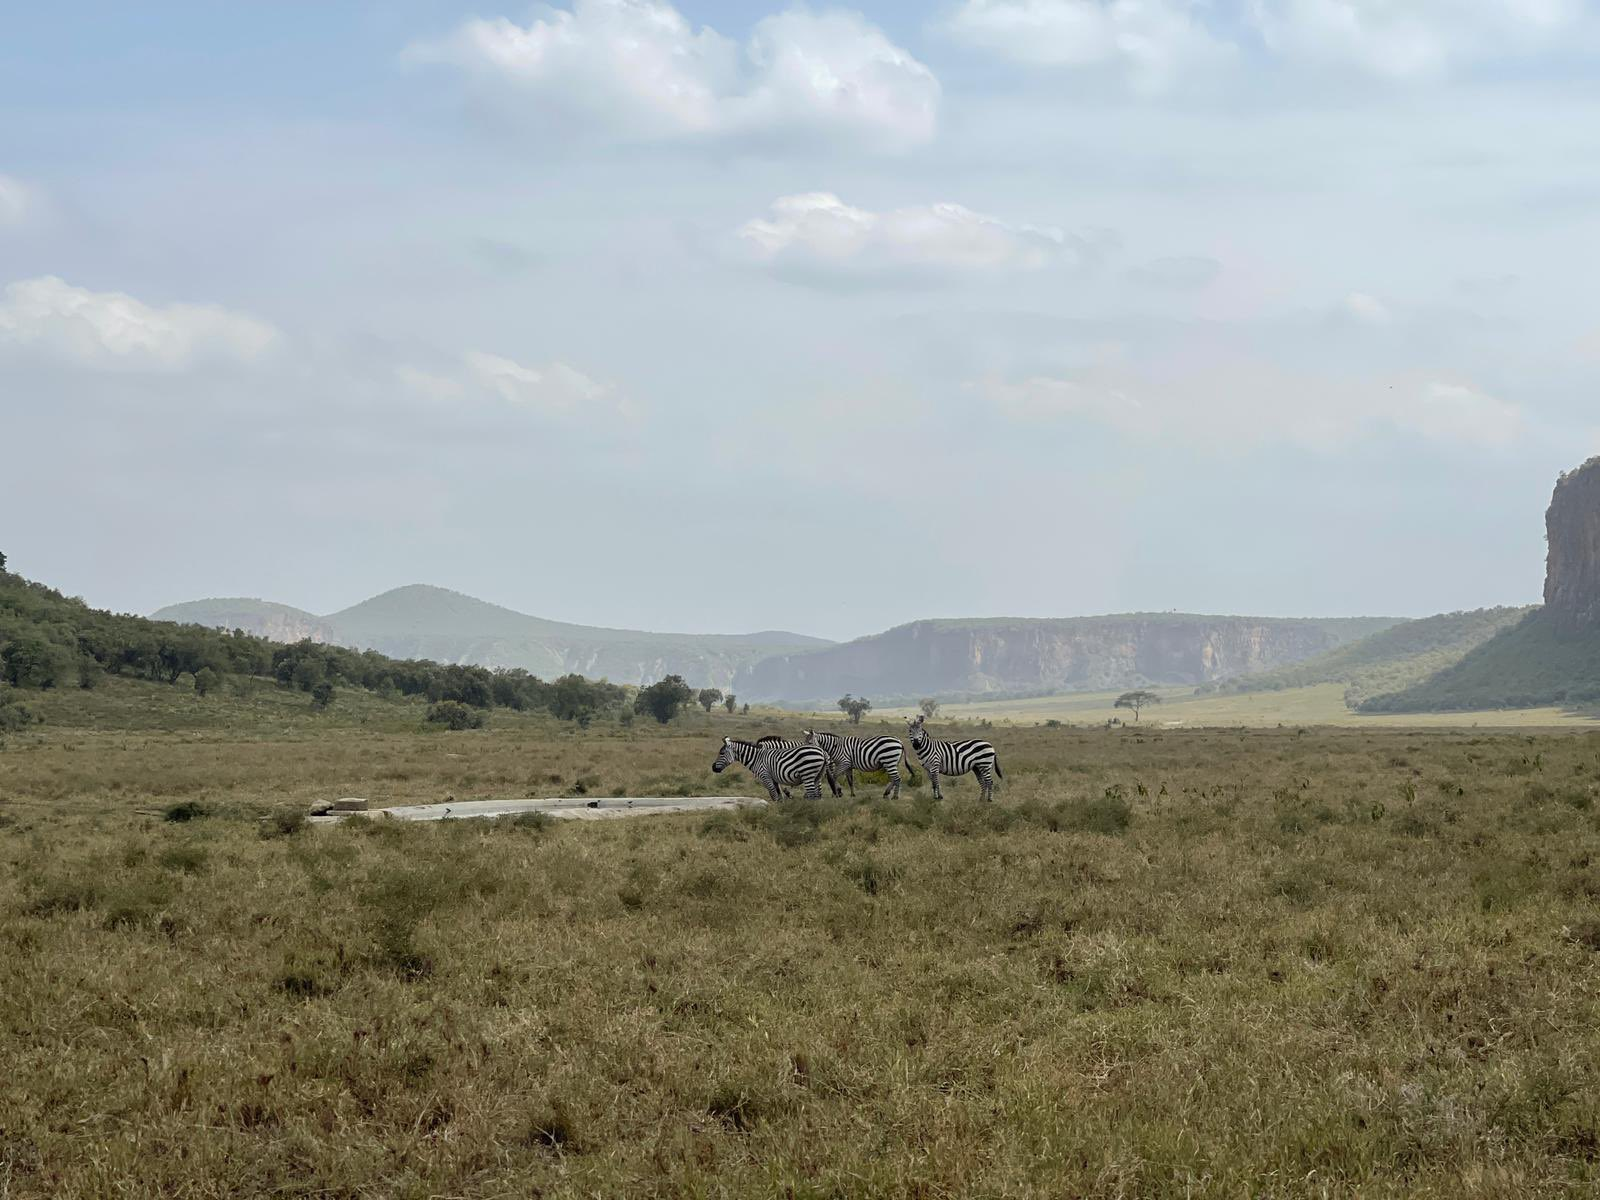 rally-safari-kenia-soymotor.jpg